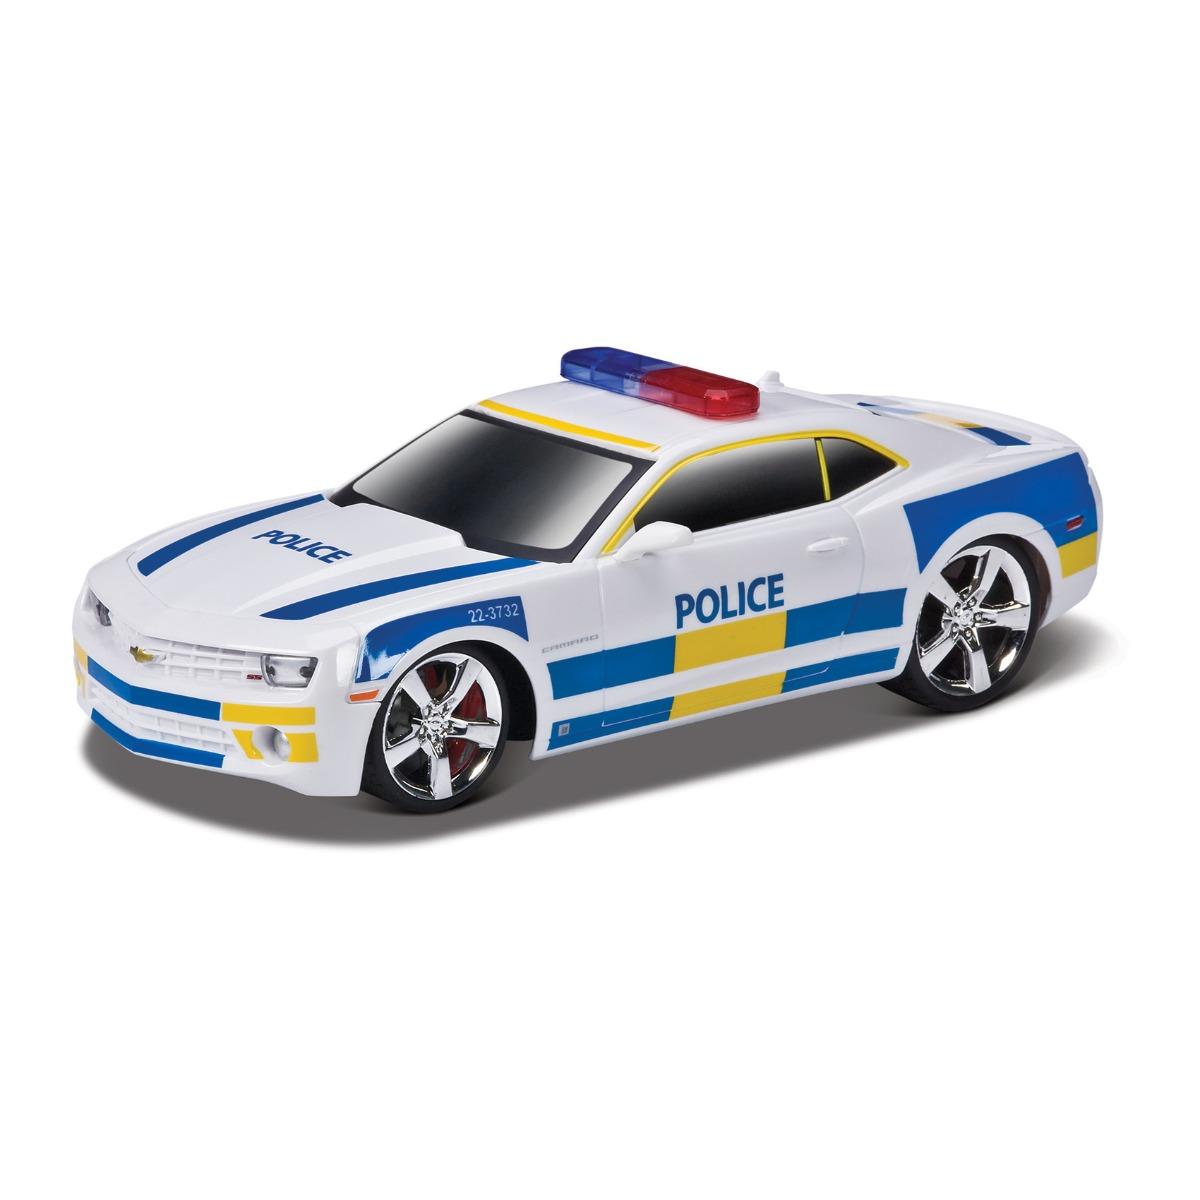 Masinuta Maisto MotoSounds Chevrolet Camaro SS RS 2010 (masina de politie) 1:24, Alb